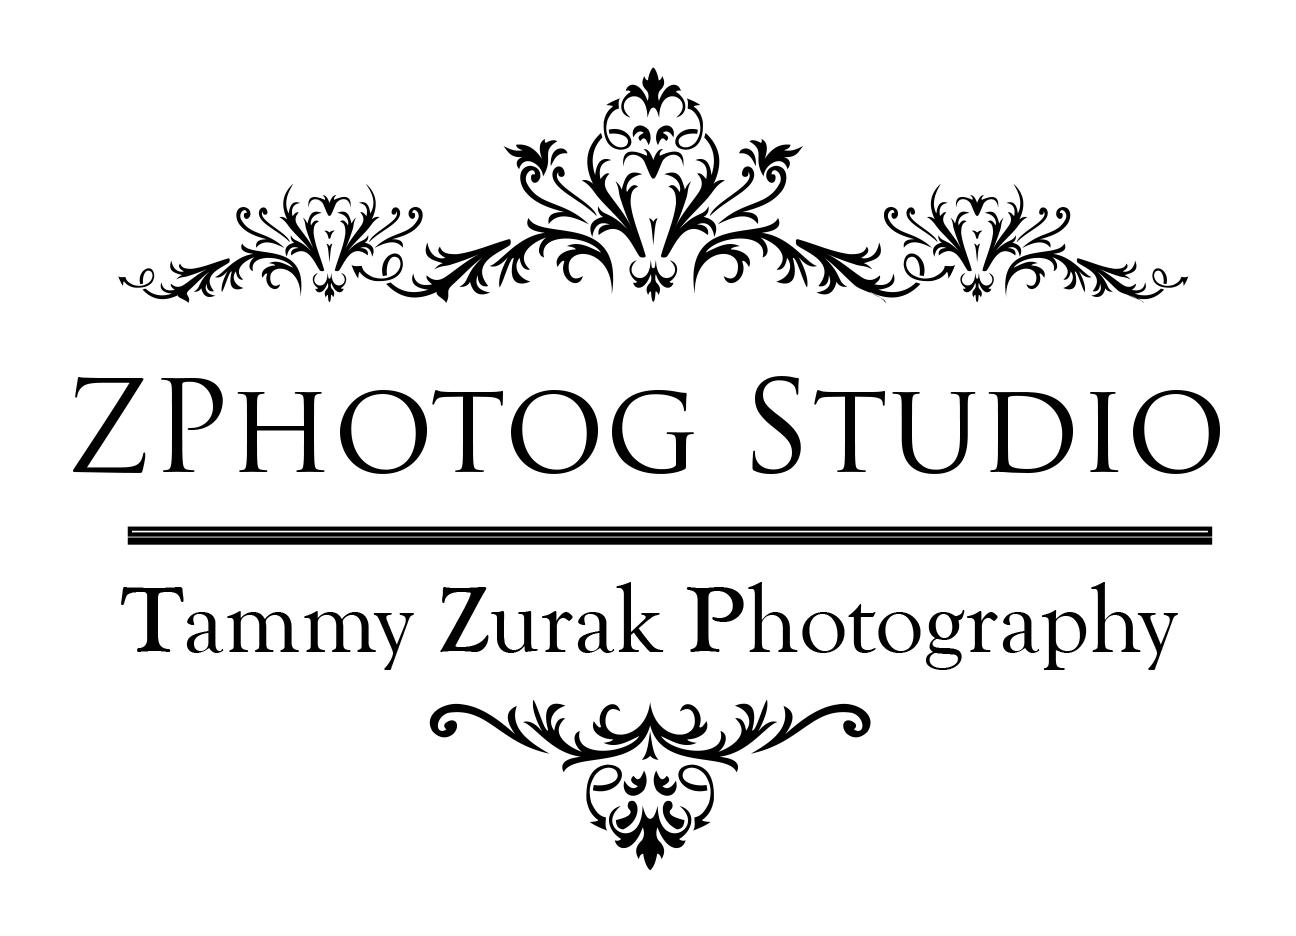 Z Photog Studio